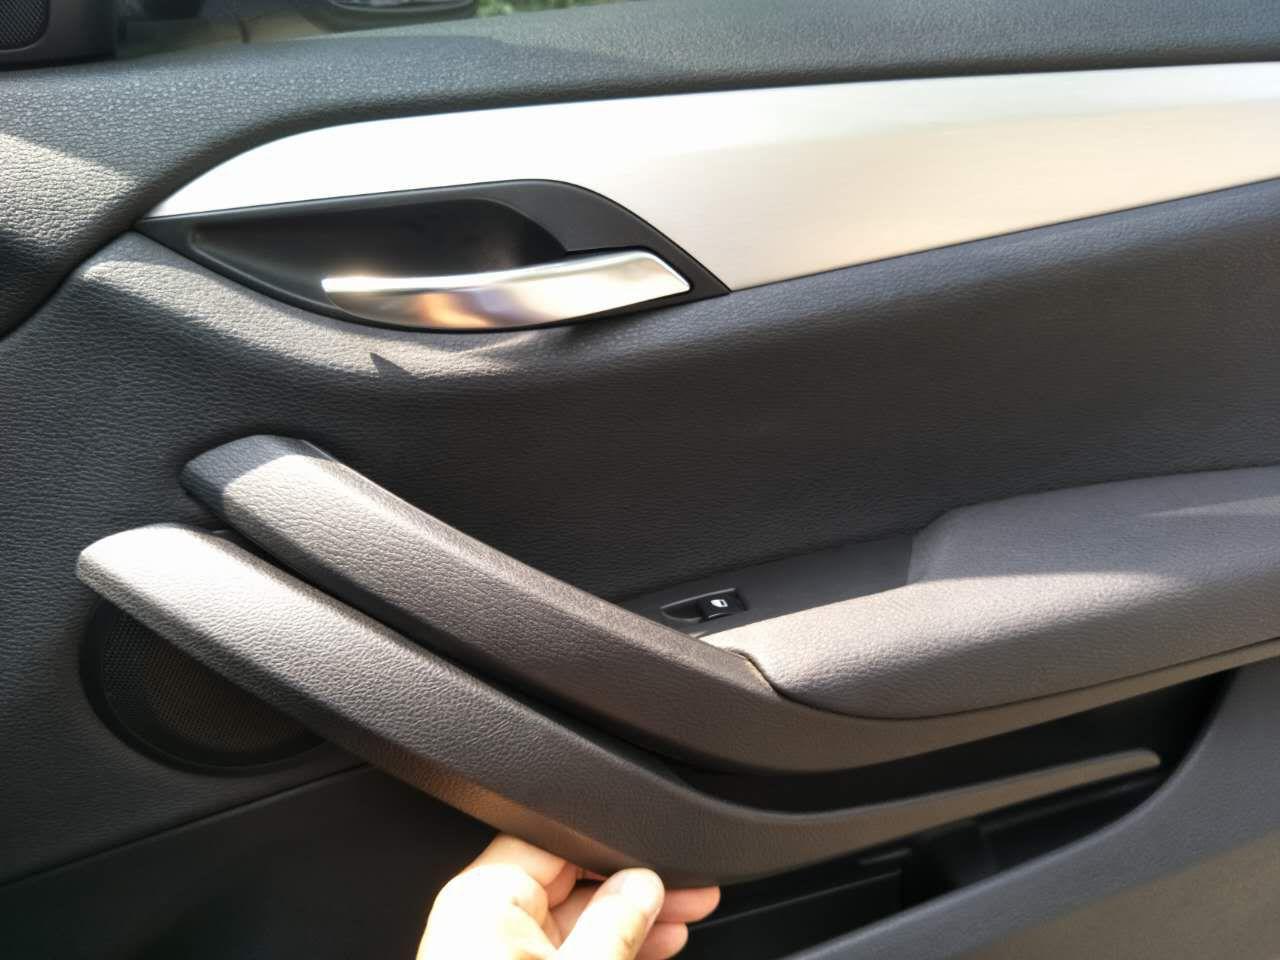 Compre Fionsee Abs Manija Interior De La Puerta Del Automovil Para Bmw X1 E84 Manija Interior Adorno 2010 A 2015 A 31 97 Del Yhh2089871607 Dhgate Com